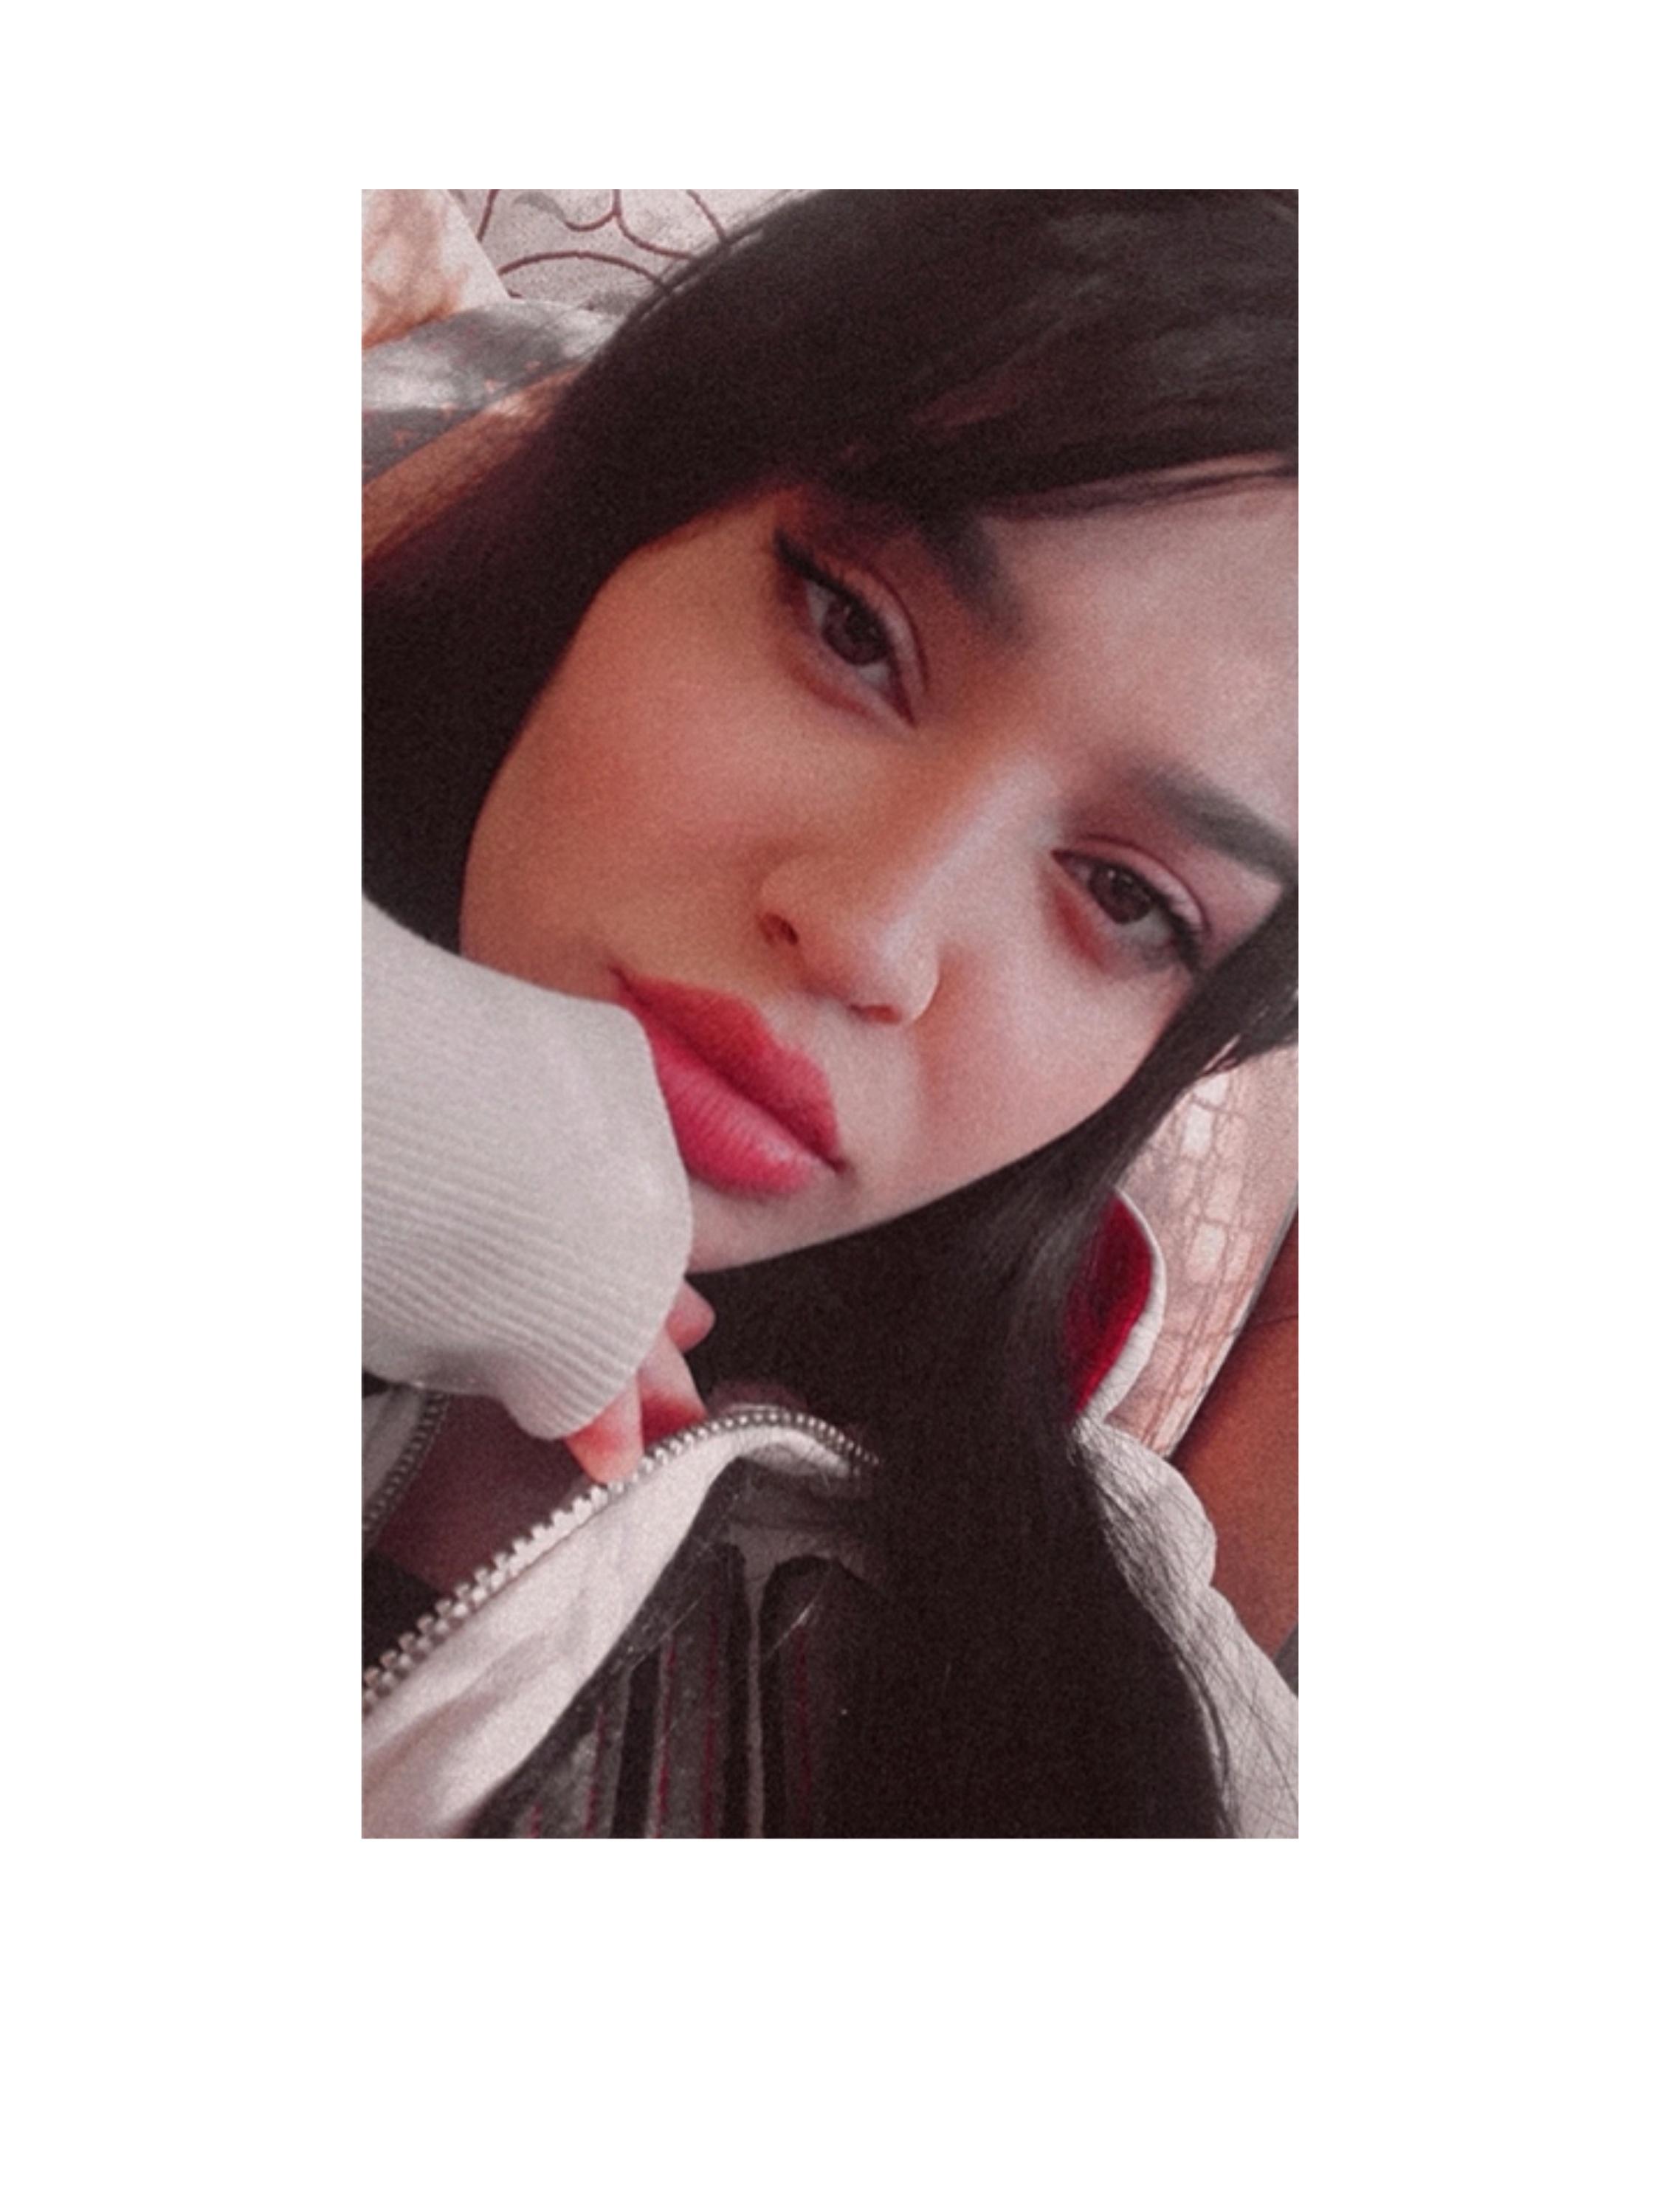 BeautyPlus_20200510034333799_save - ryuklemobi